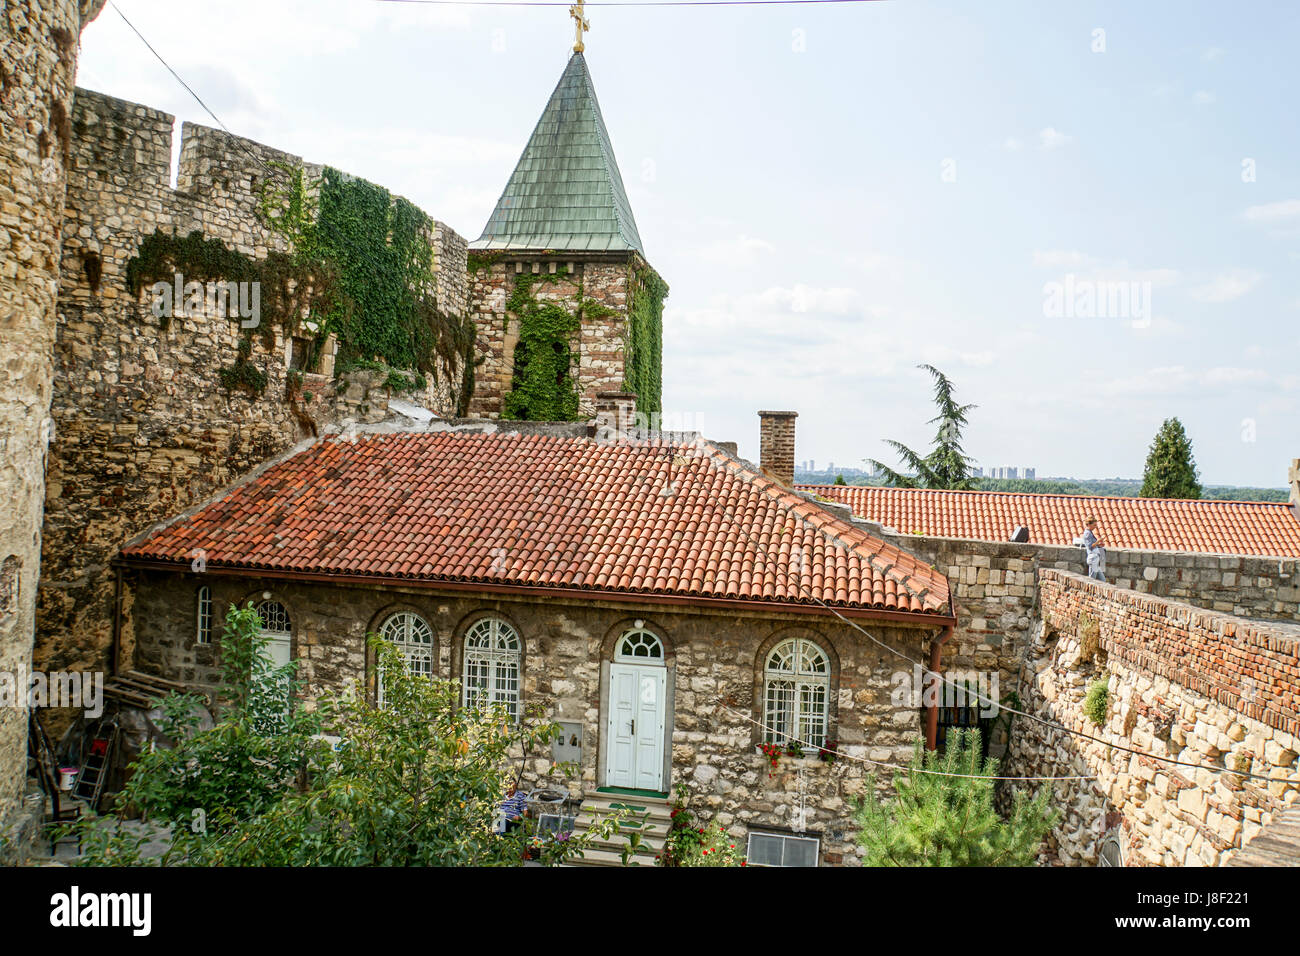 Kalemegdan Fortress, Belgrade, Serbia - Stock Image